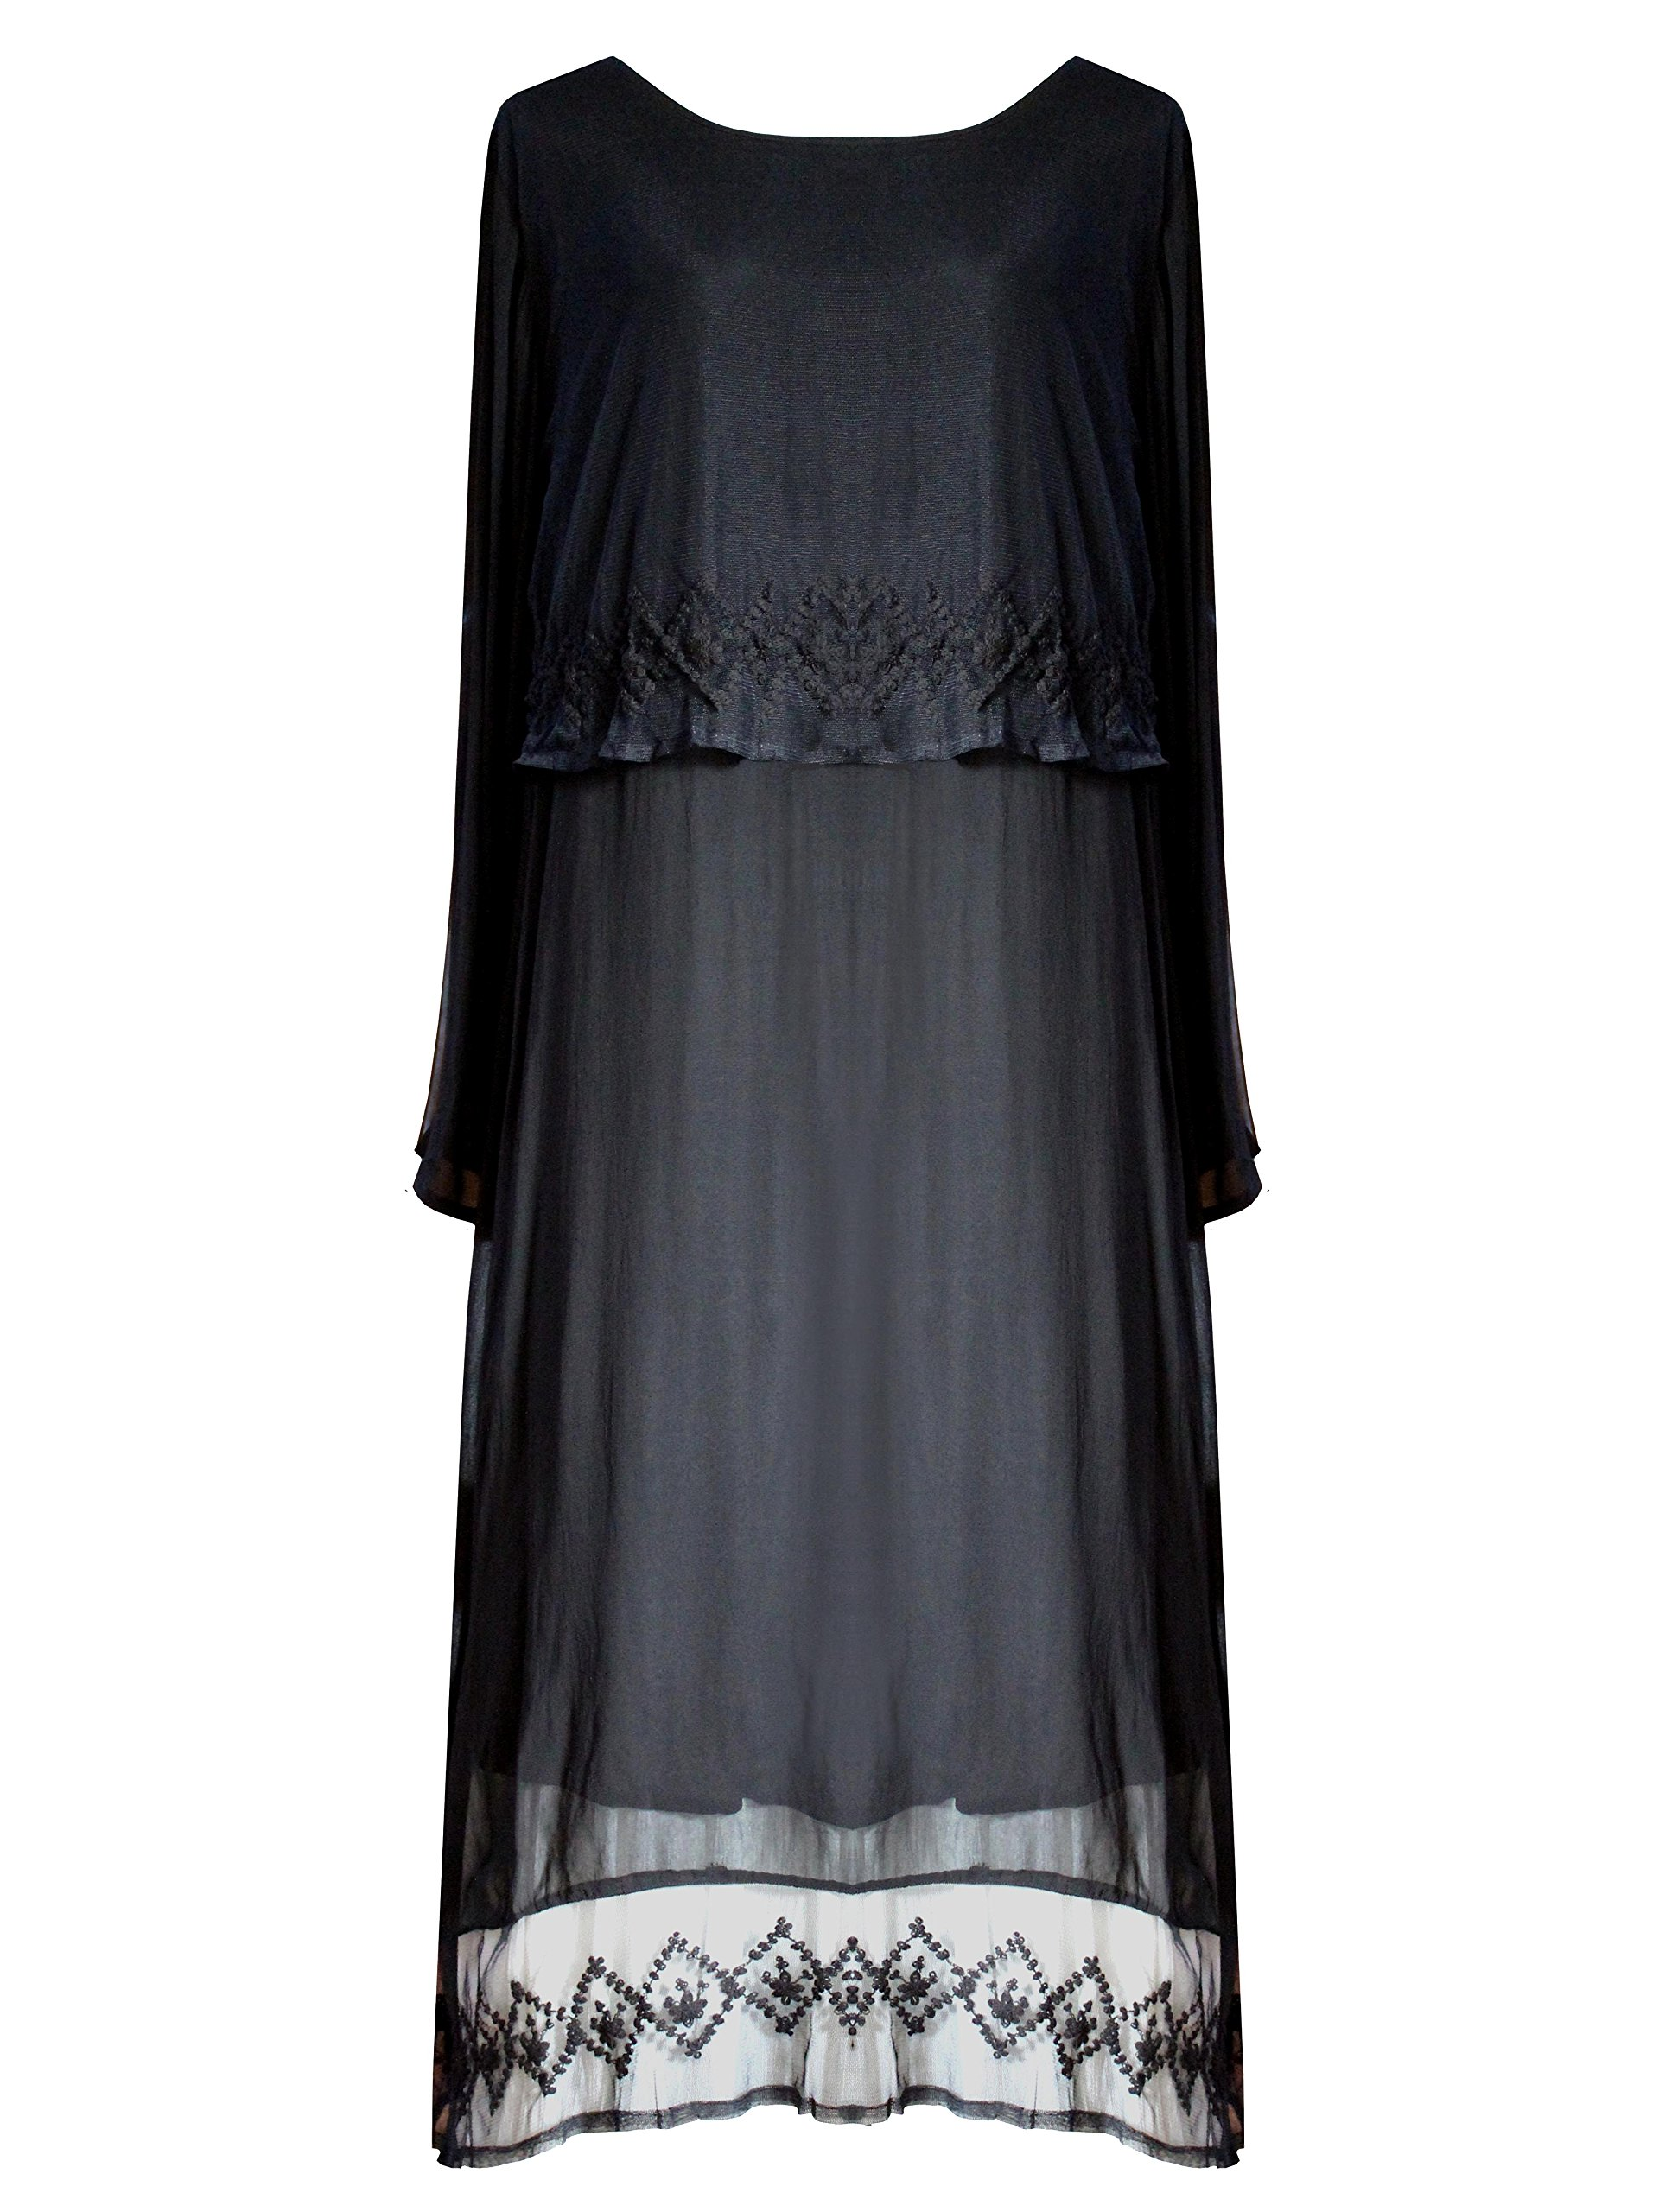 Funhouse Victorian Valentine Gothic Steampunk Juliet Renaissance Dress Black L XL 1X 3